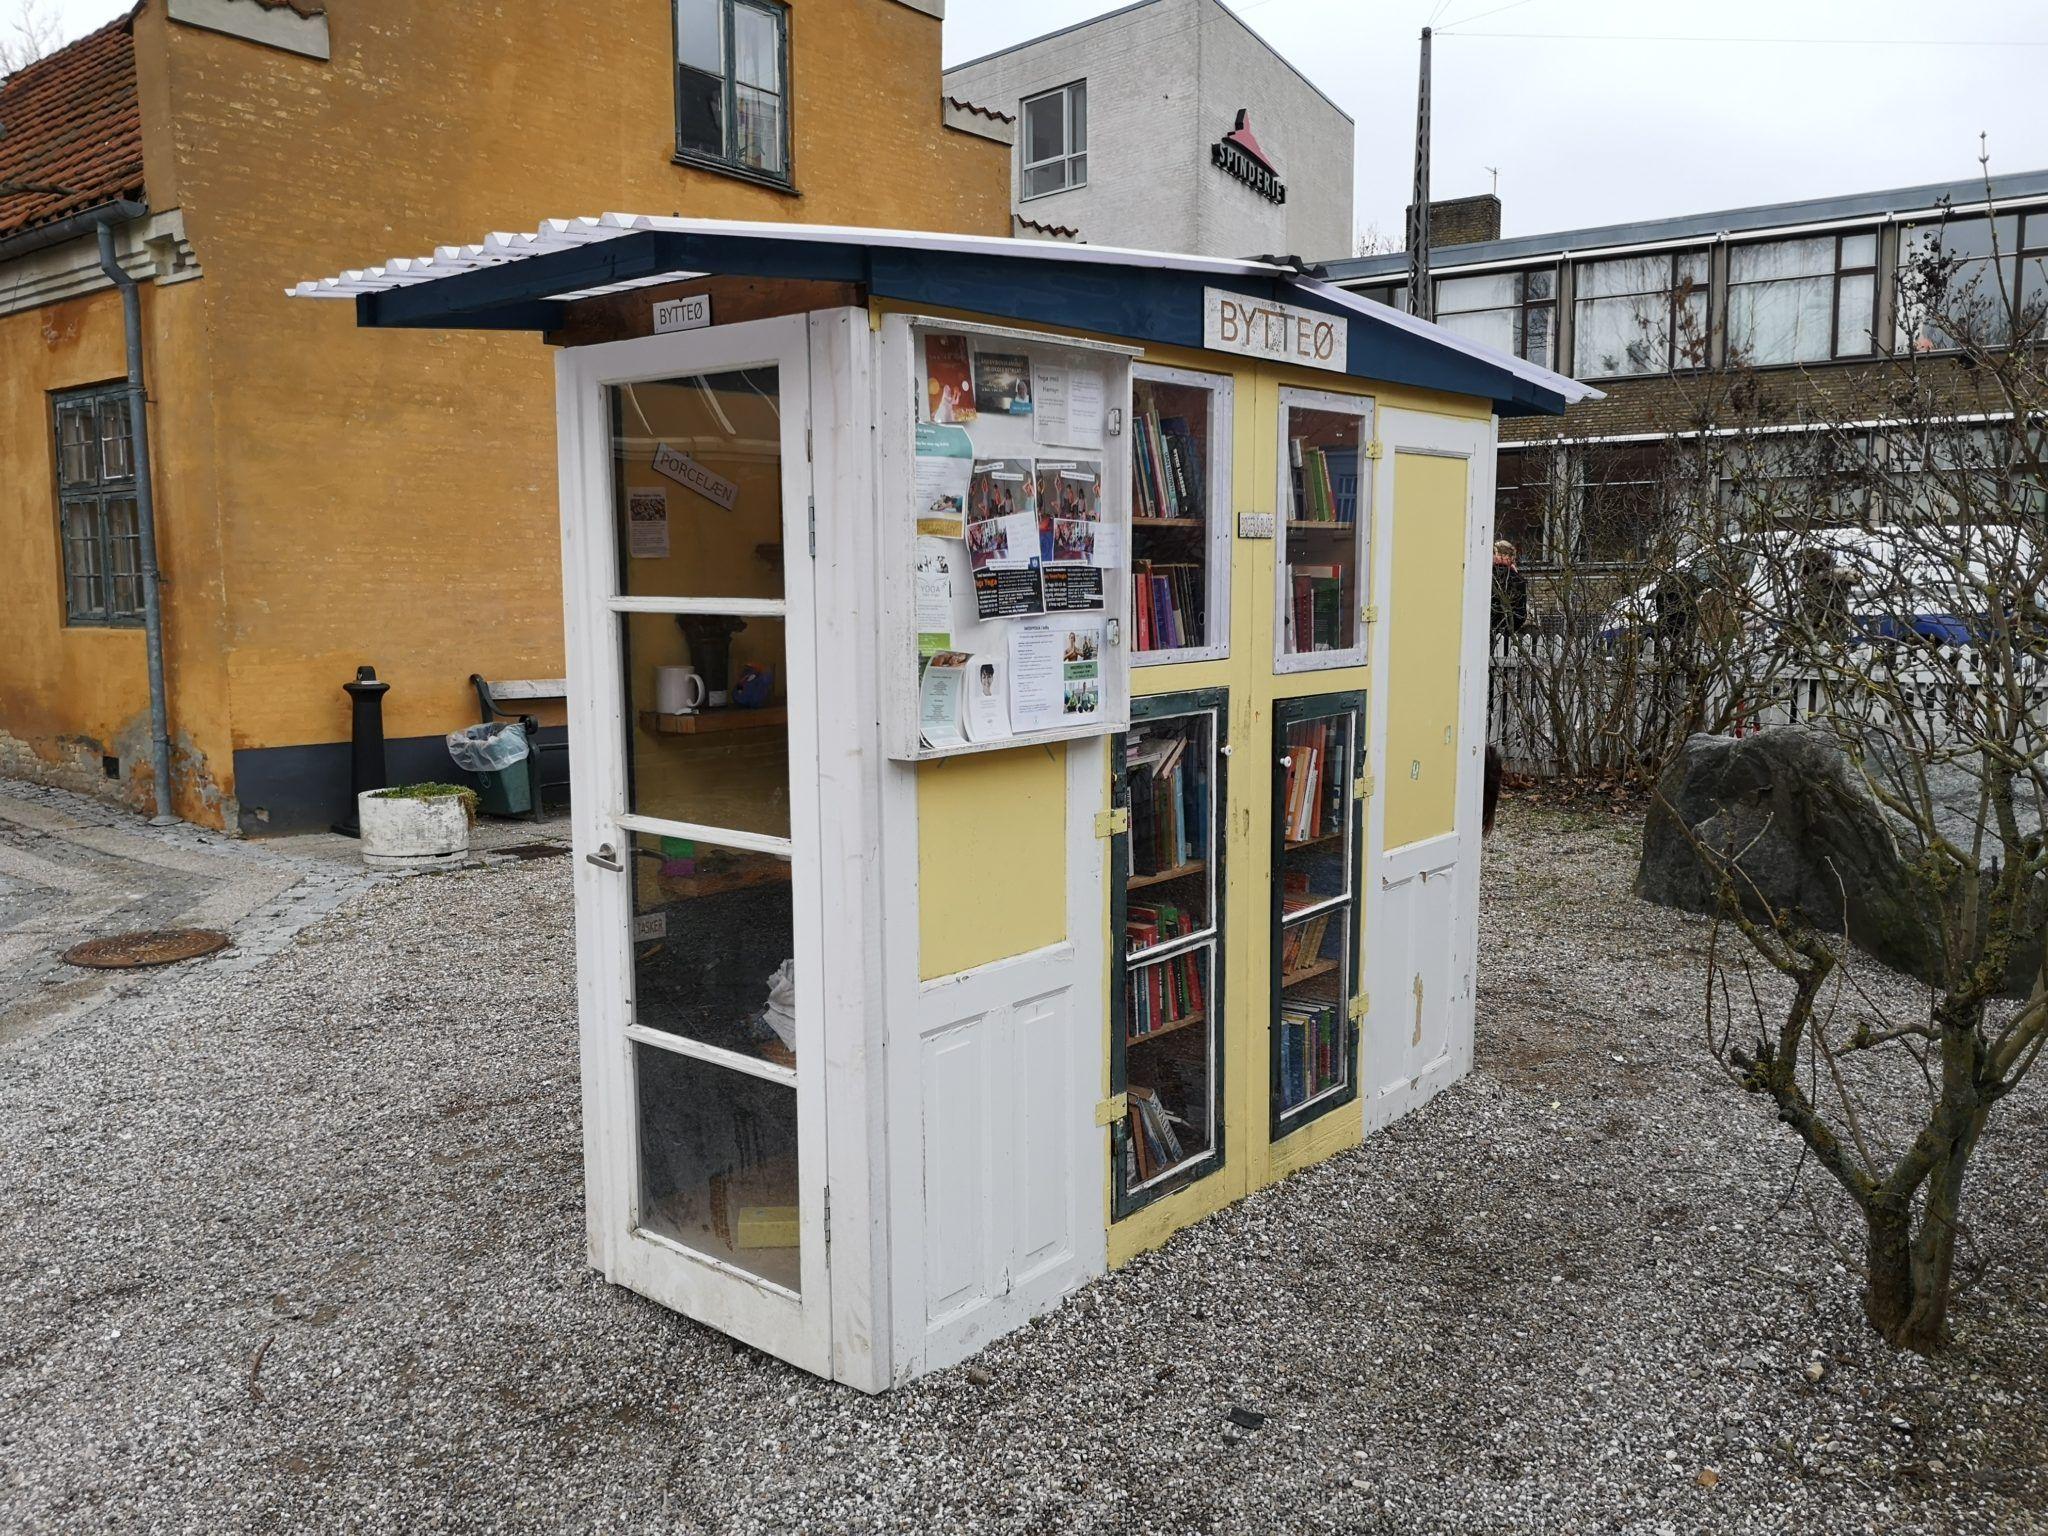 Bytteø Valby Bibliotek